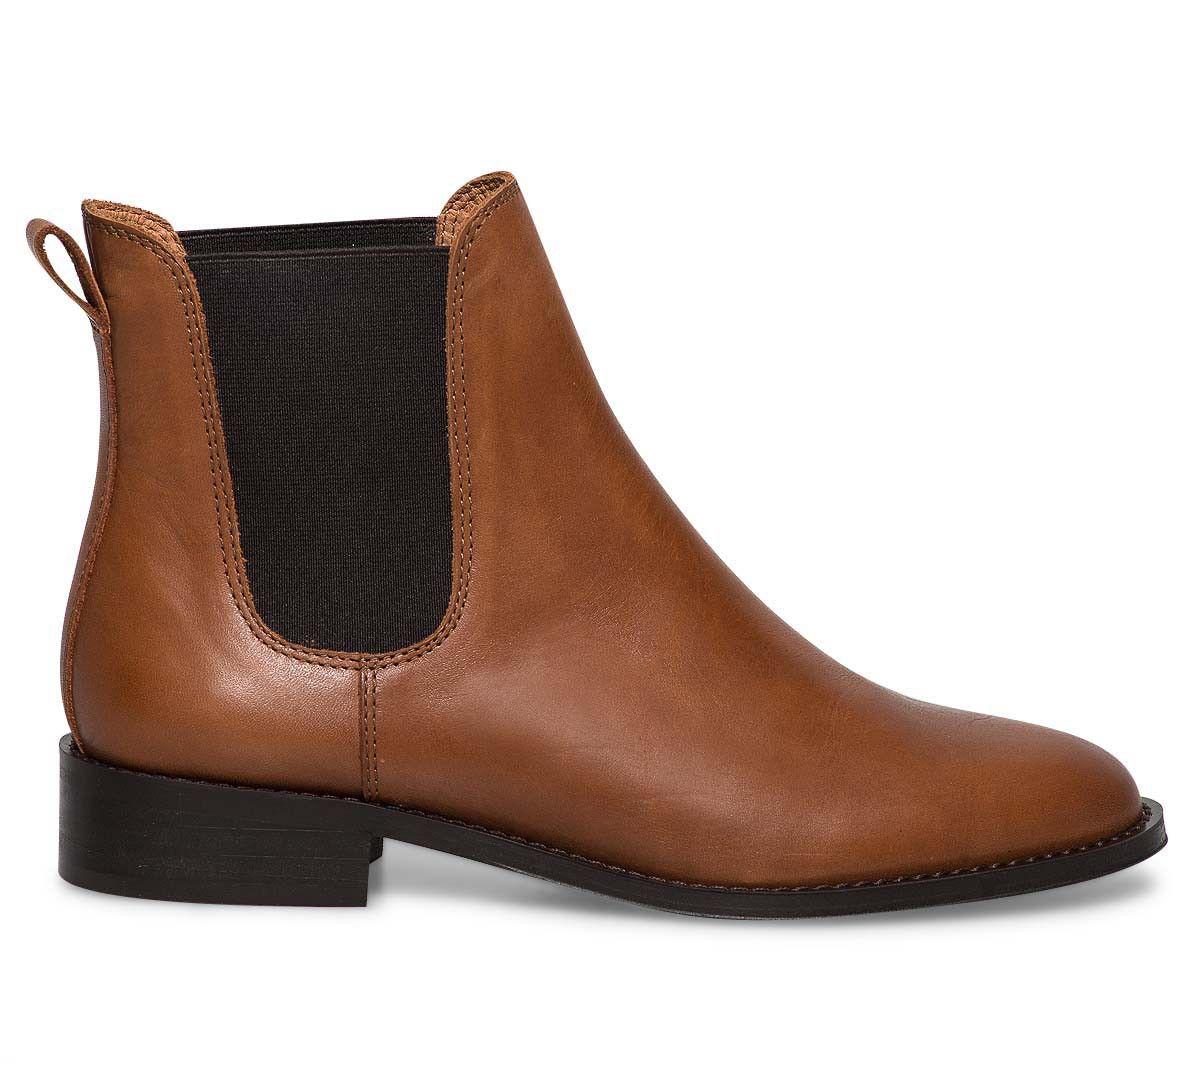 chelsea boots camel - Boots / bottines - Femme